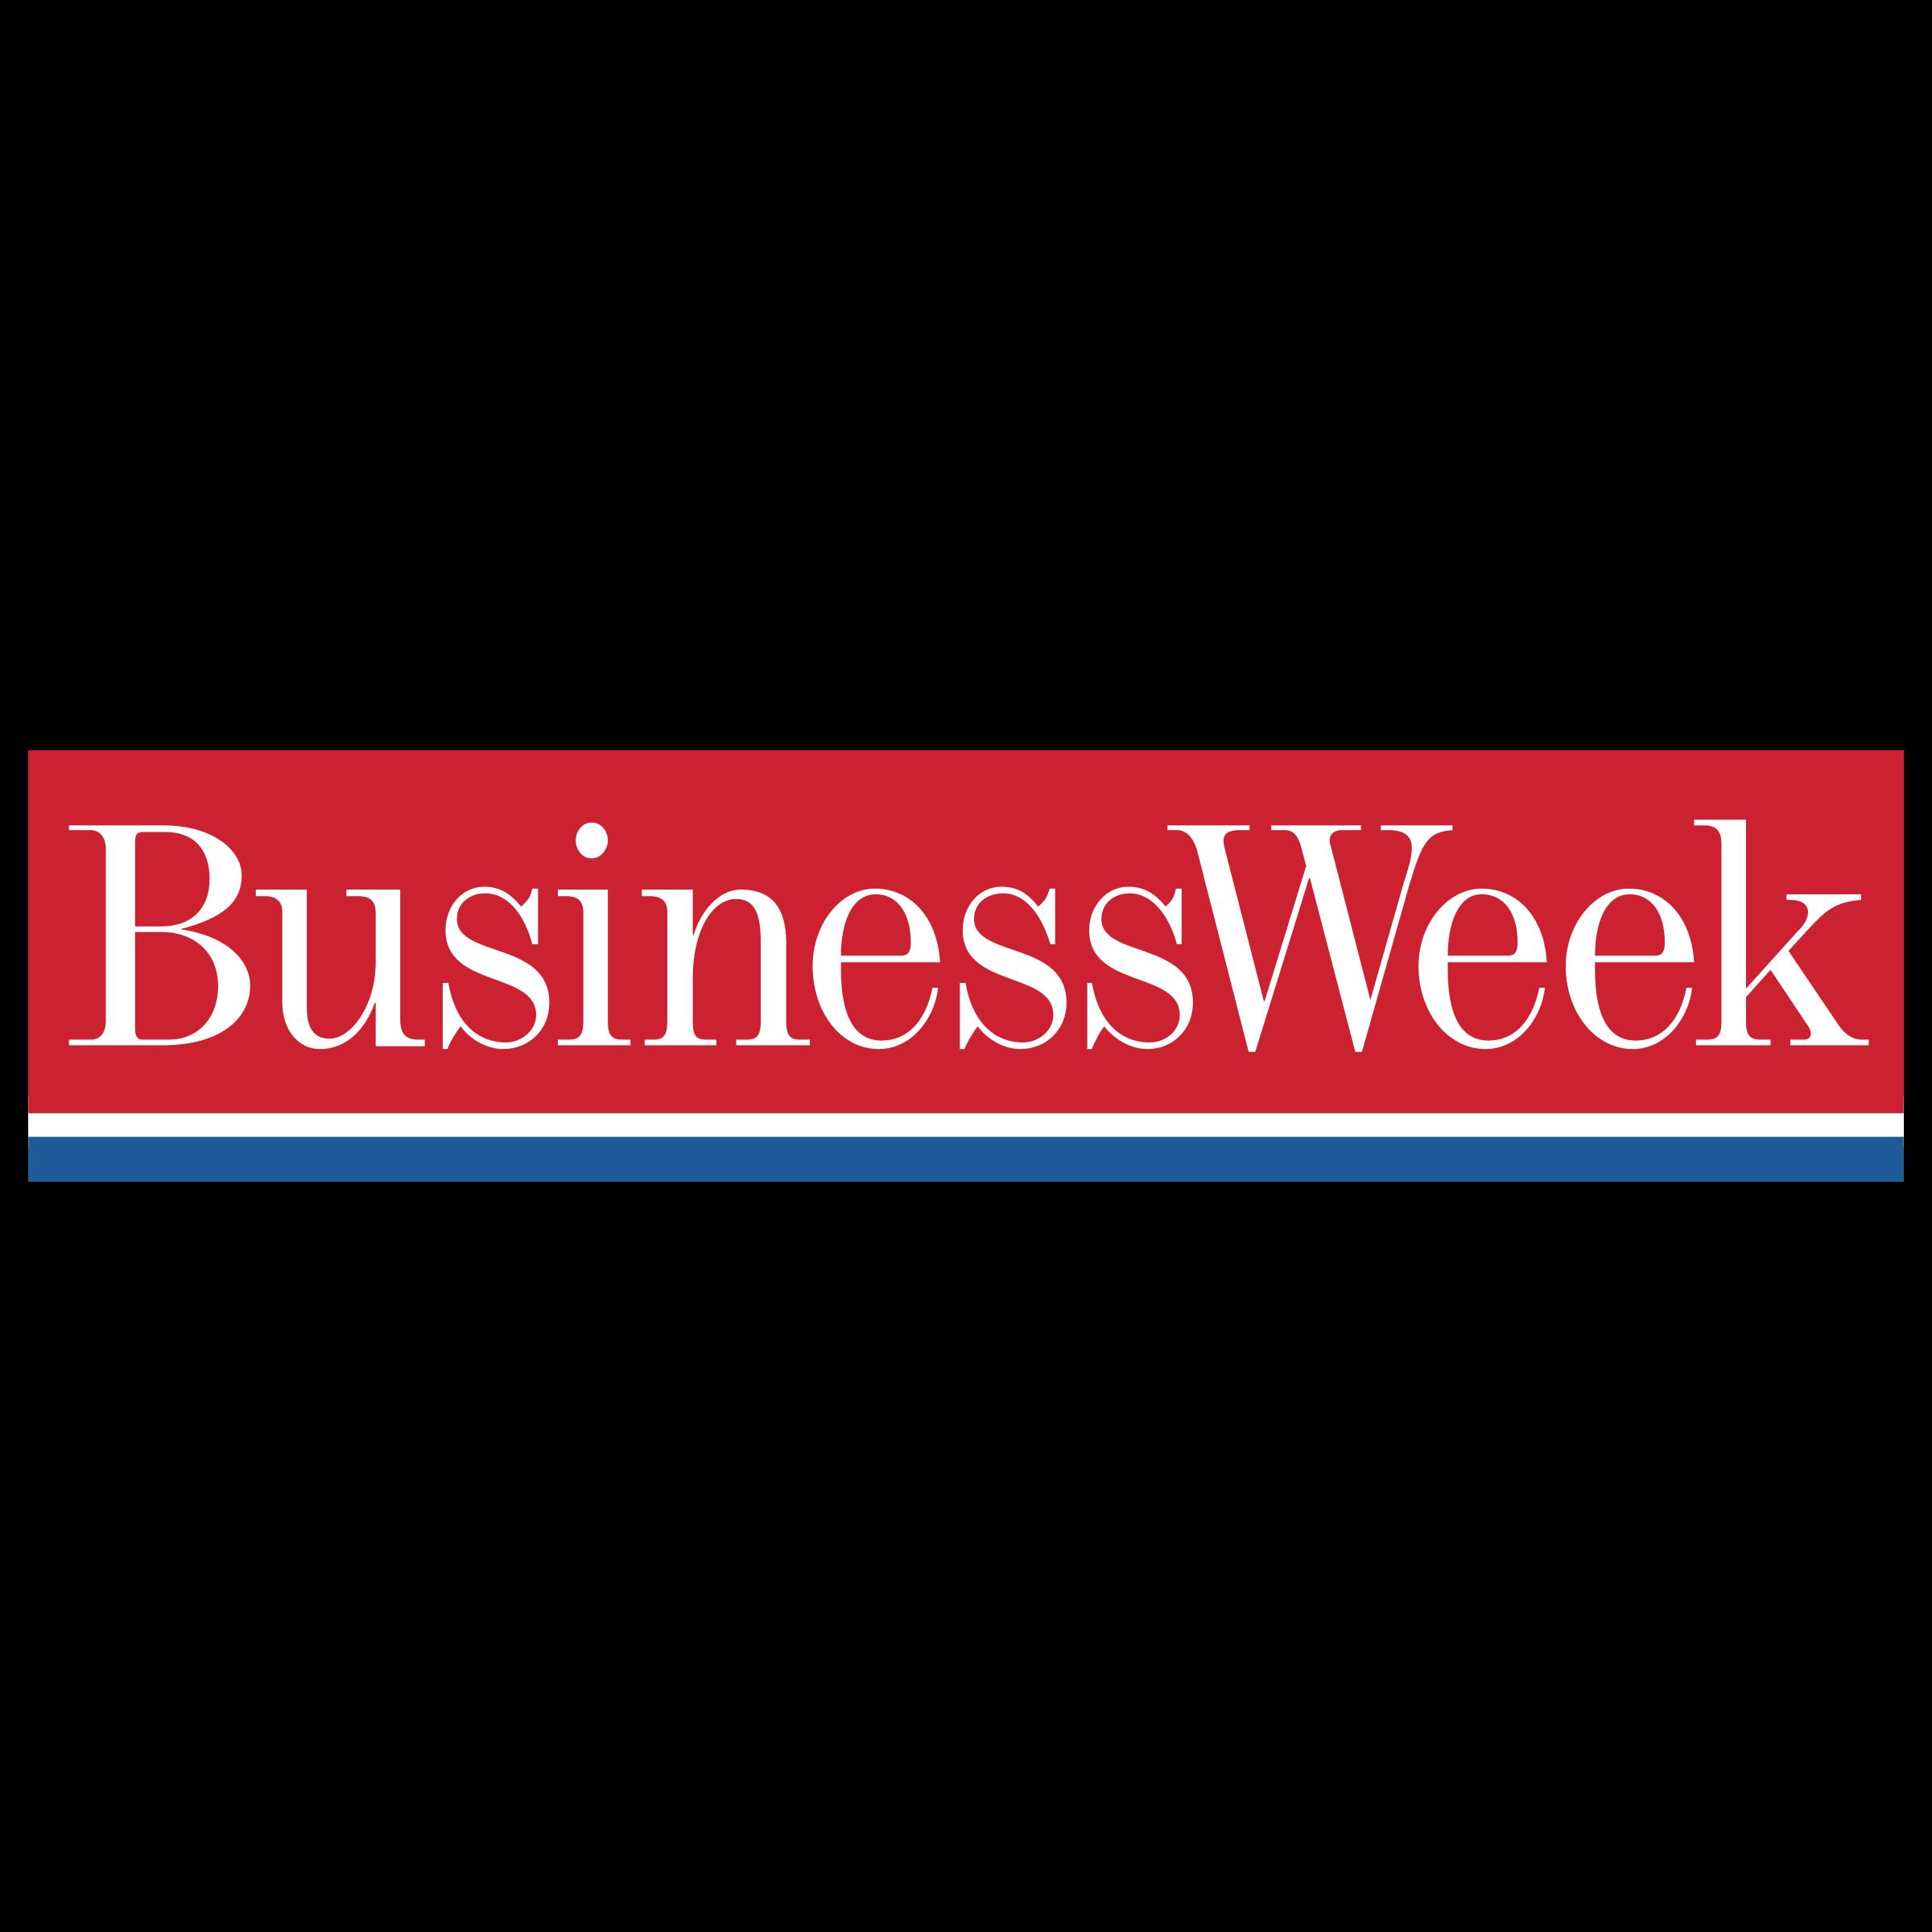 businessweek-1-logo-png-transparent.png